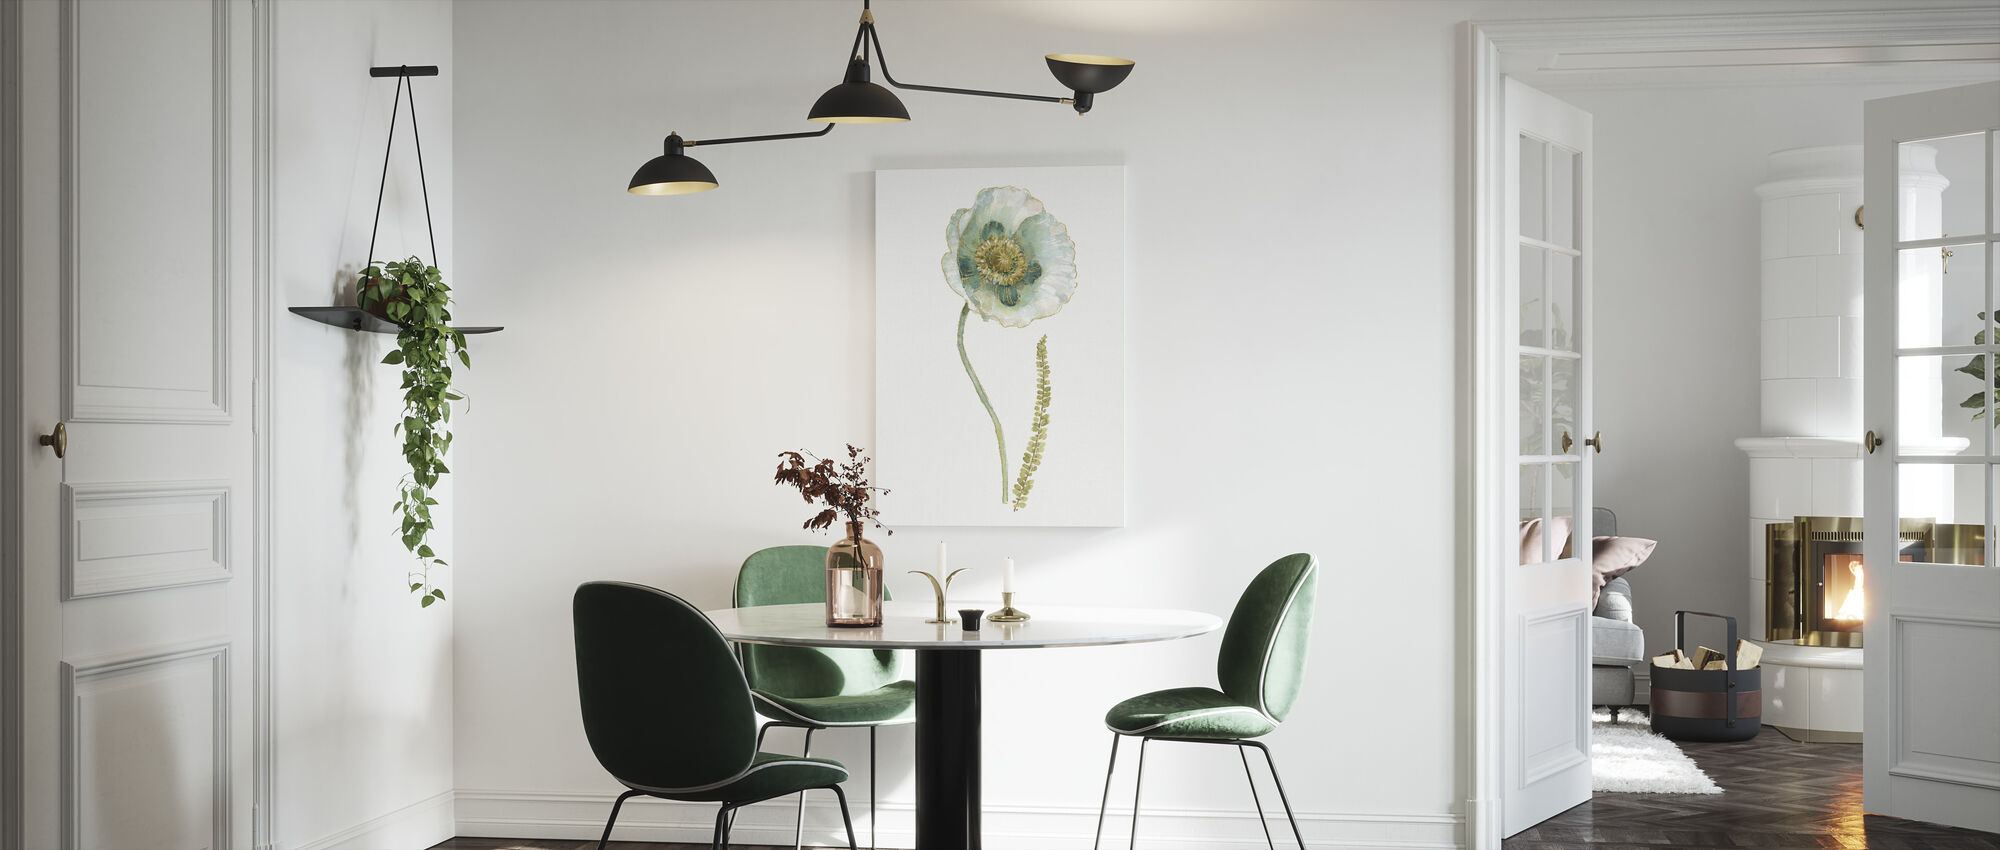 My Greenhouse Single Poppy I - Canvas print - Kitchen